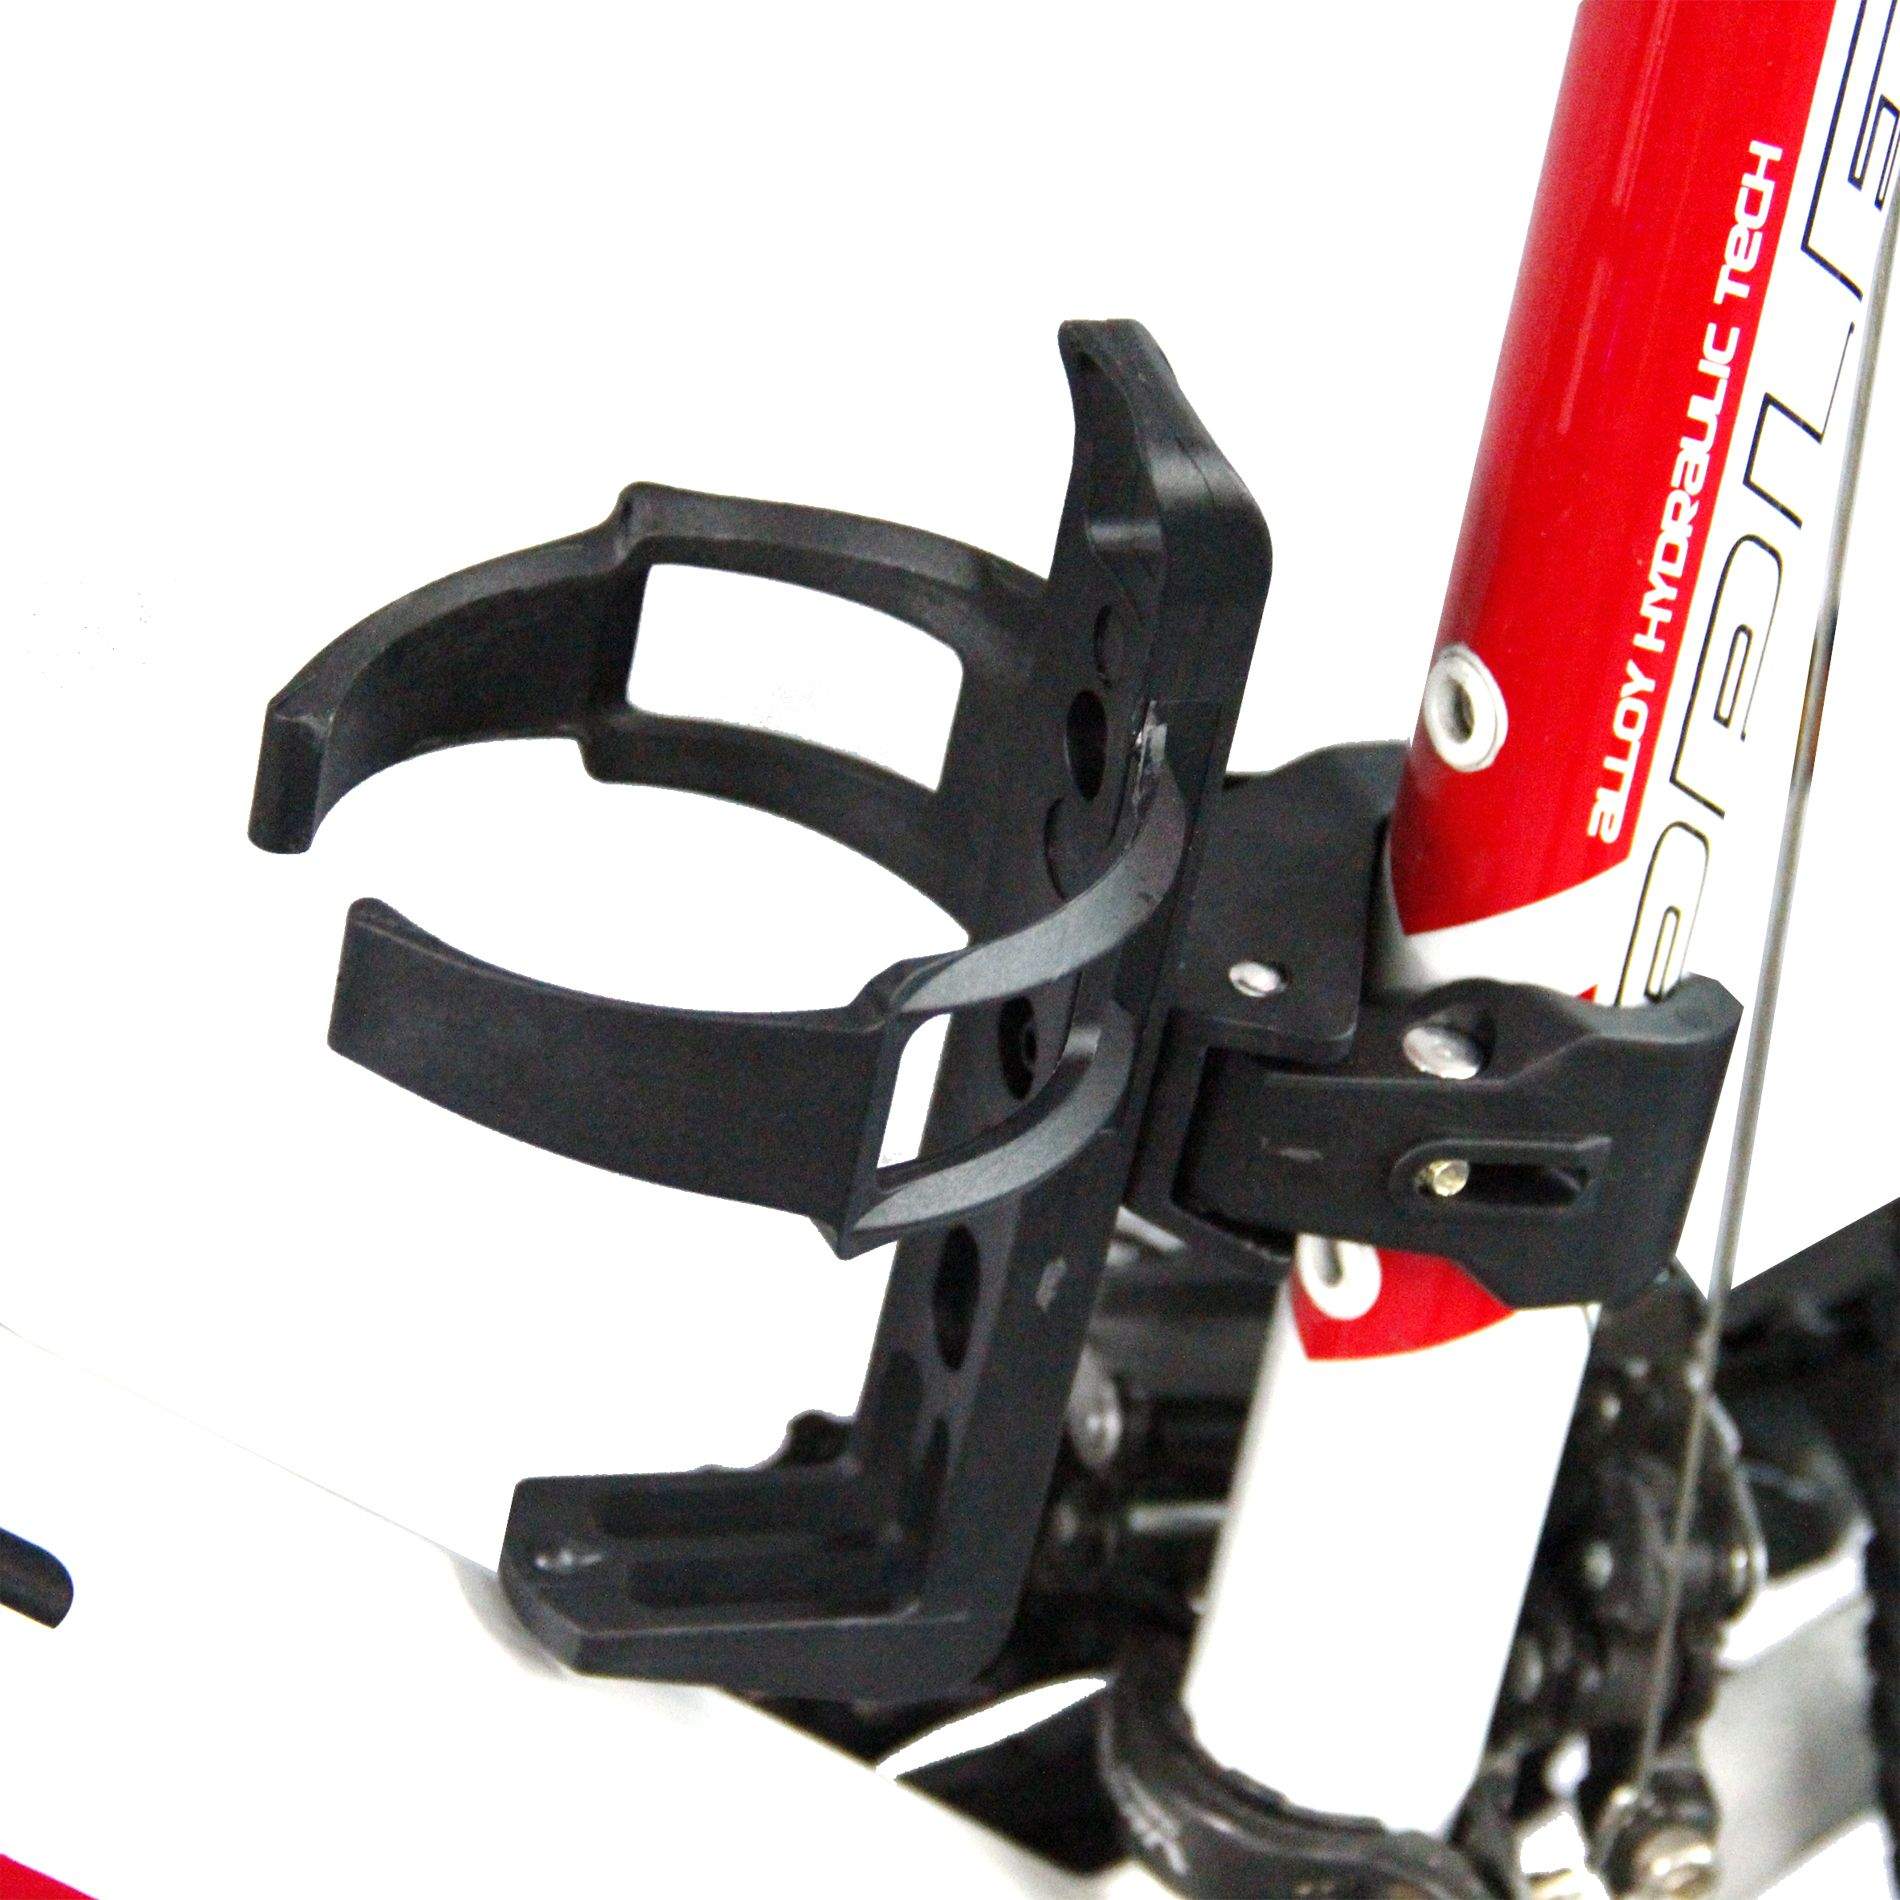 Carbon Fiber Bike Glass Water Bottle Holder Cages Black Red Colors Functional